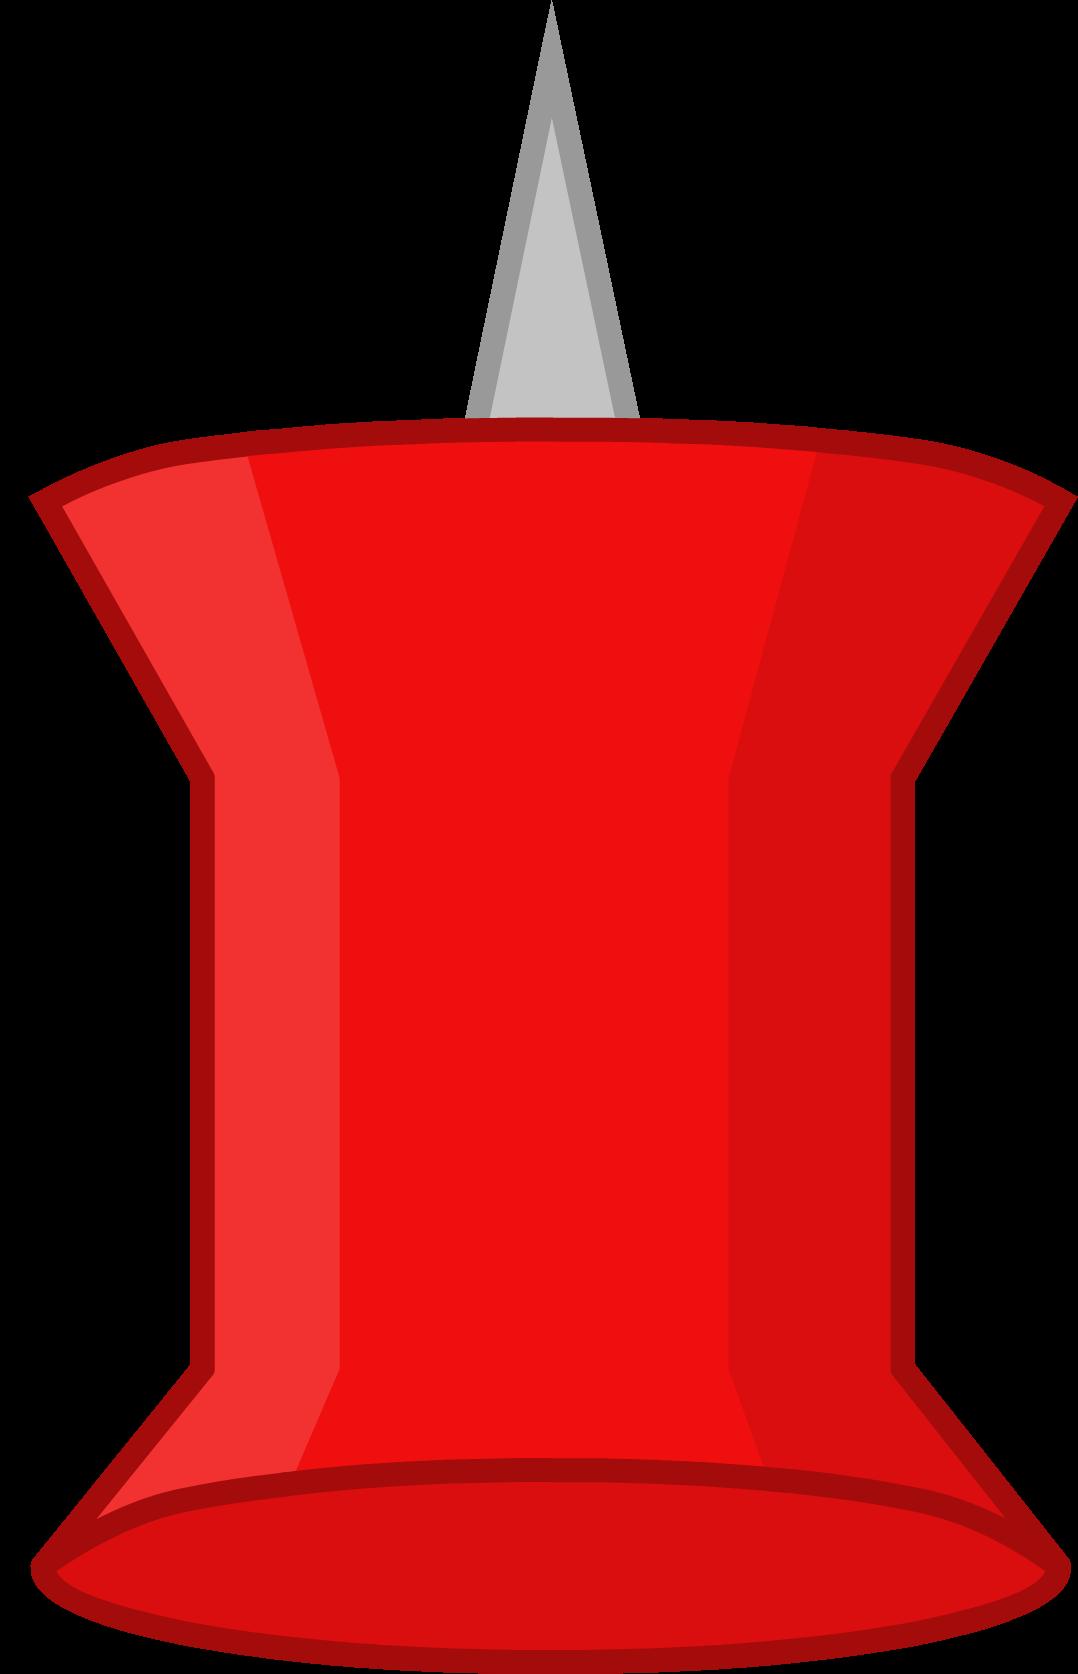 Pin long object